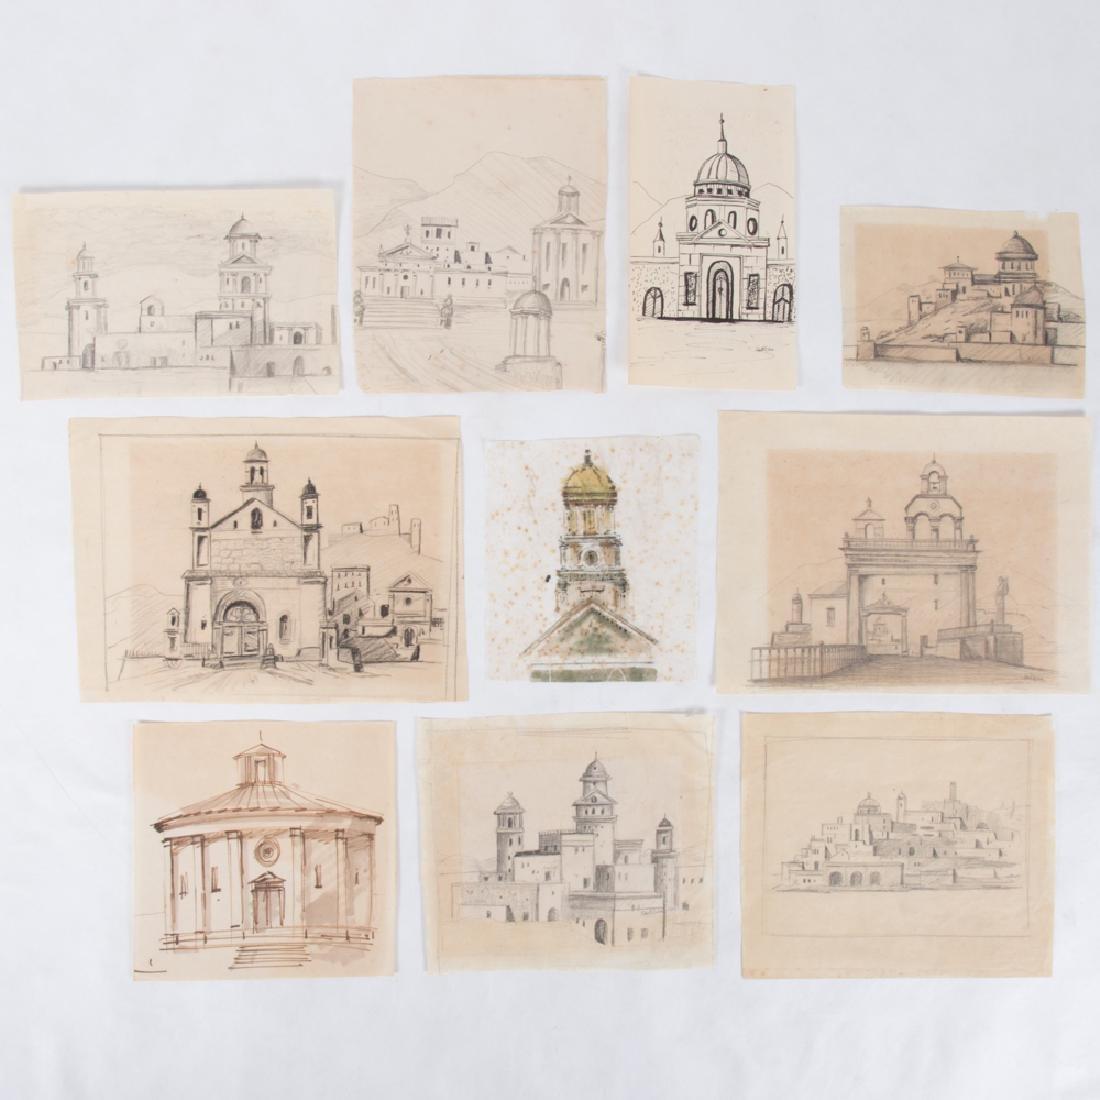 Paul Riba (1912-1977) A Group of Ten Studies, Pencil on